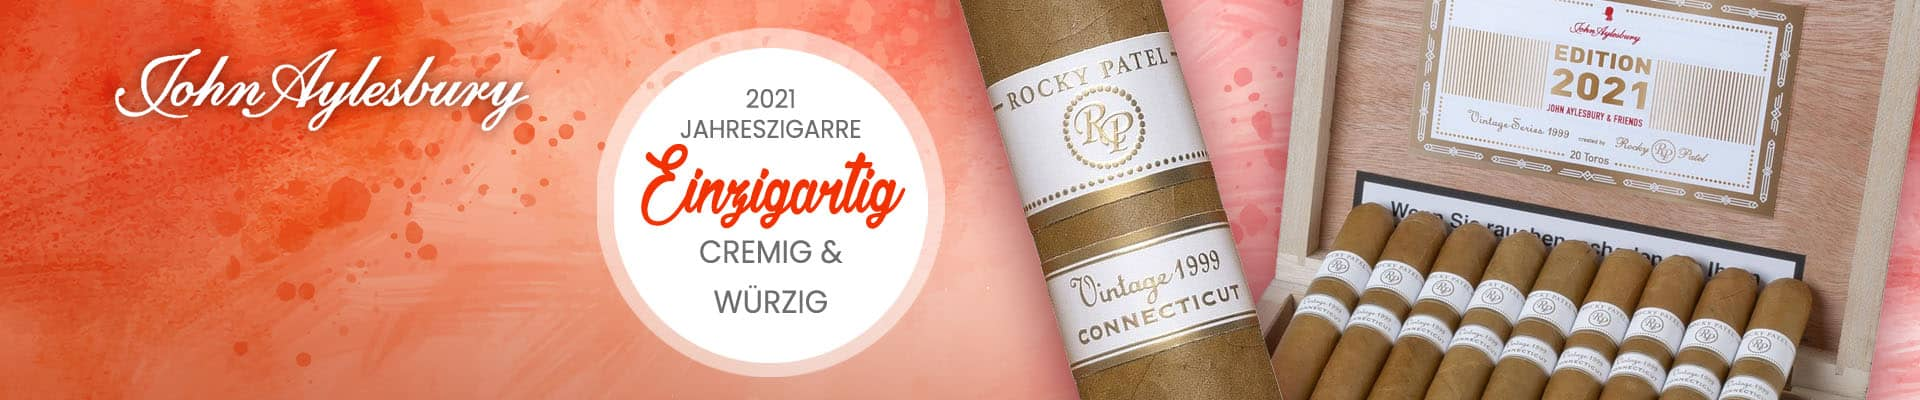 Jahreszigarre 2021 Limited Edition